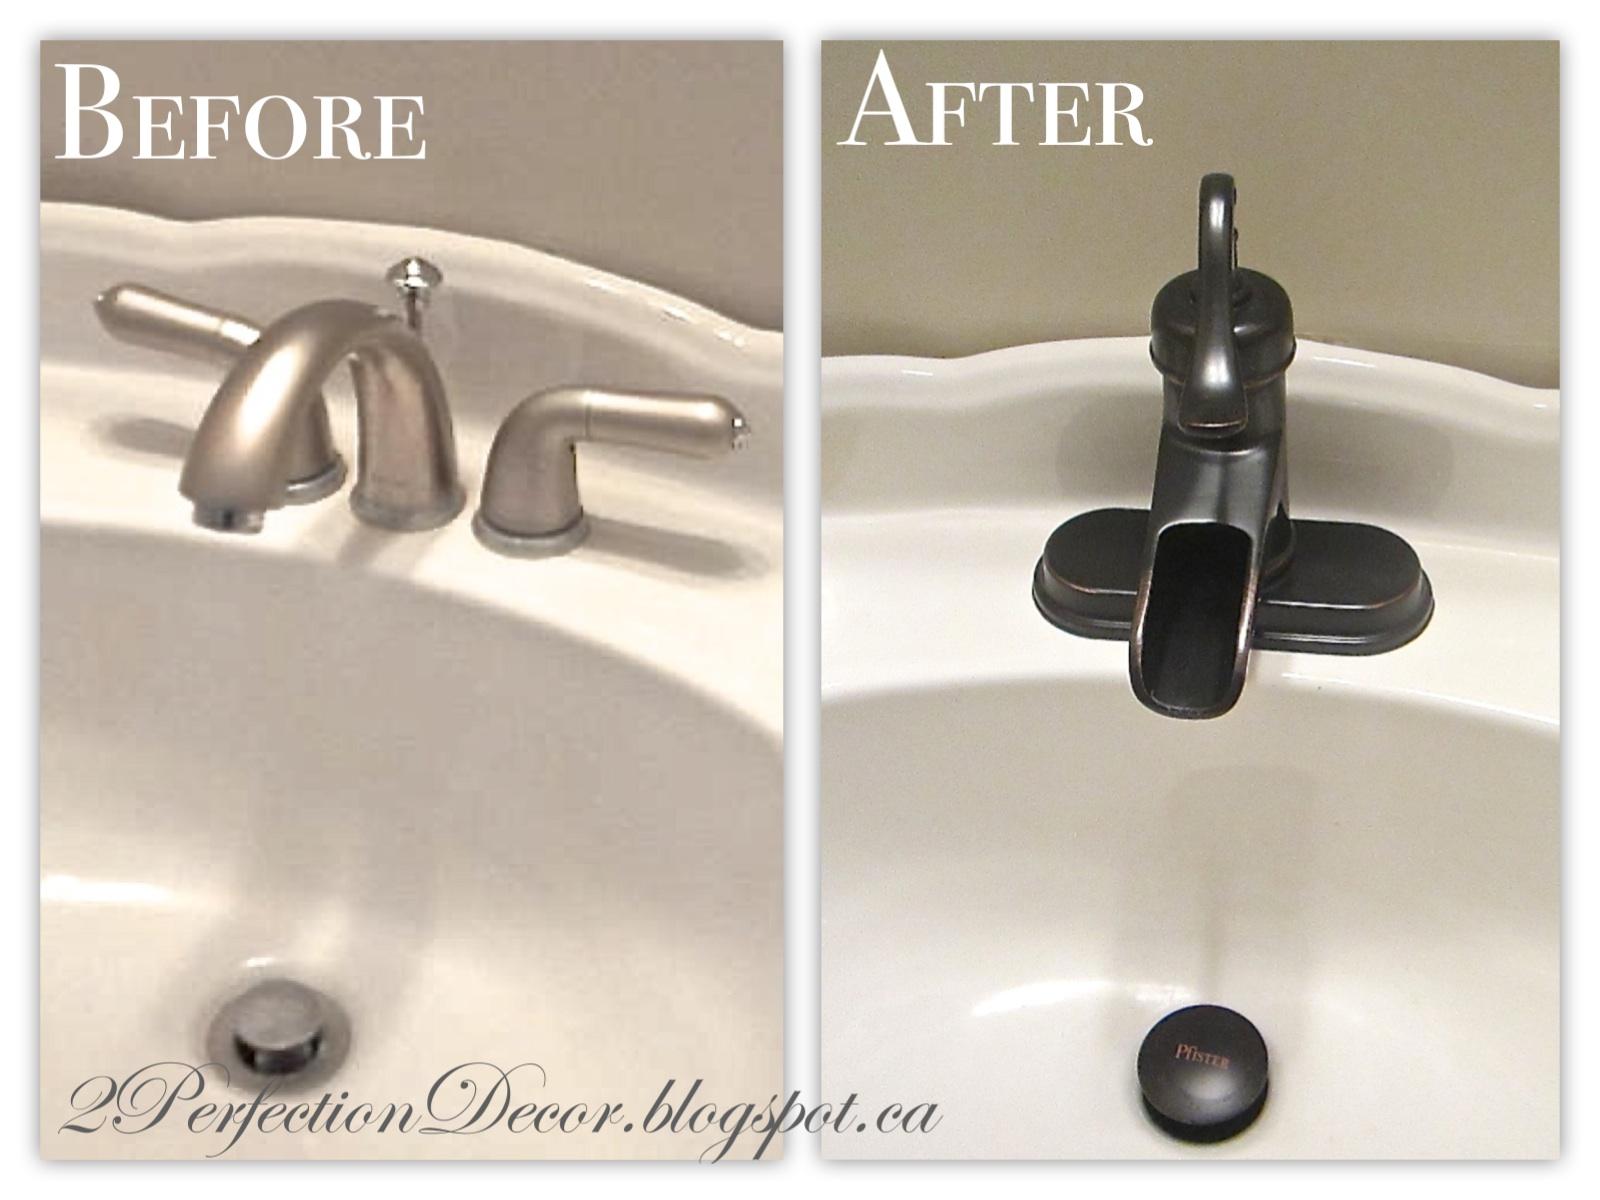 2Perfection Decor: Powder Bath Updates